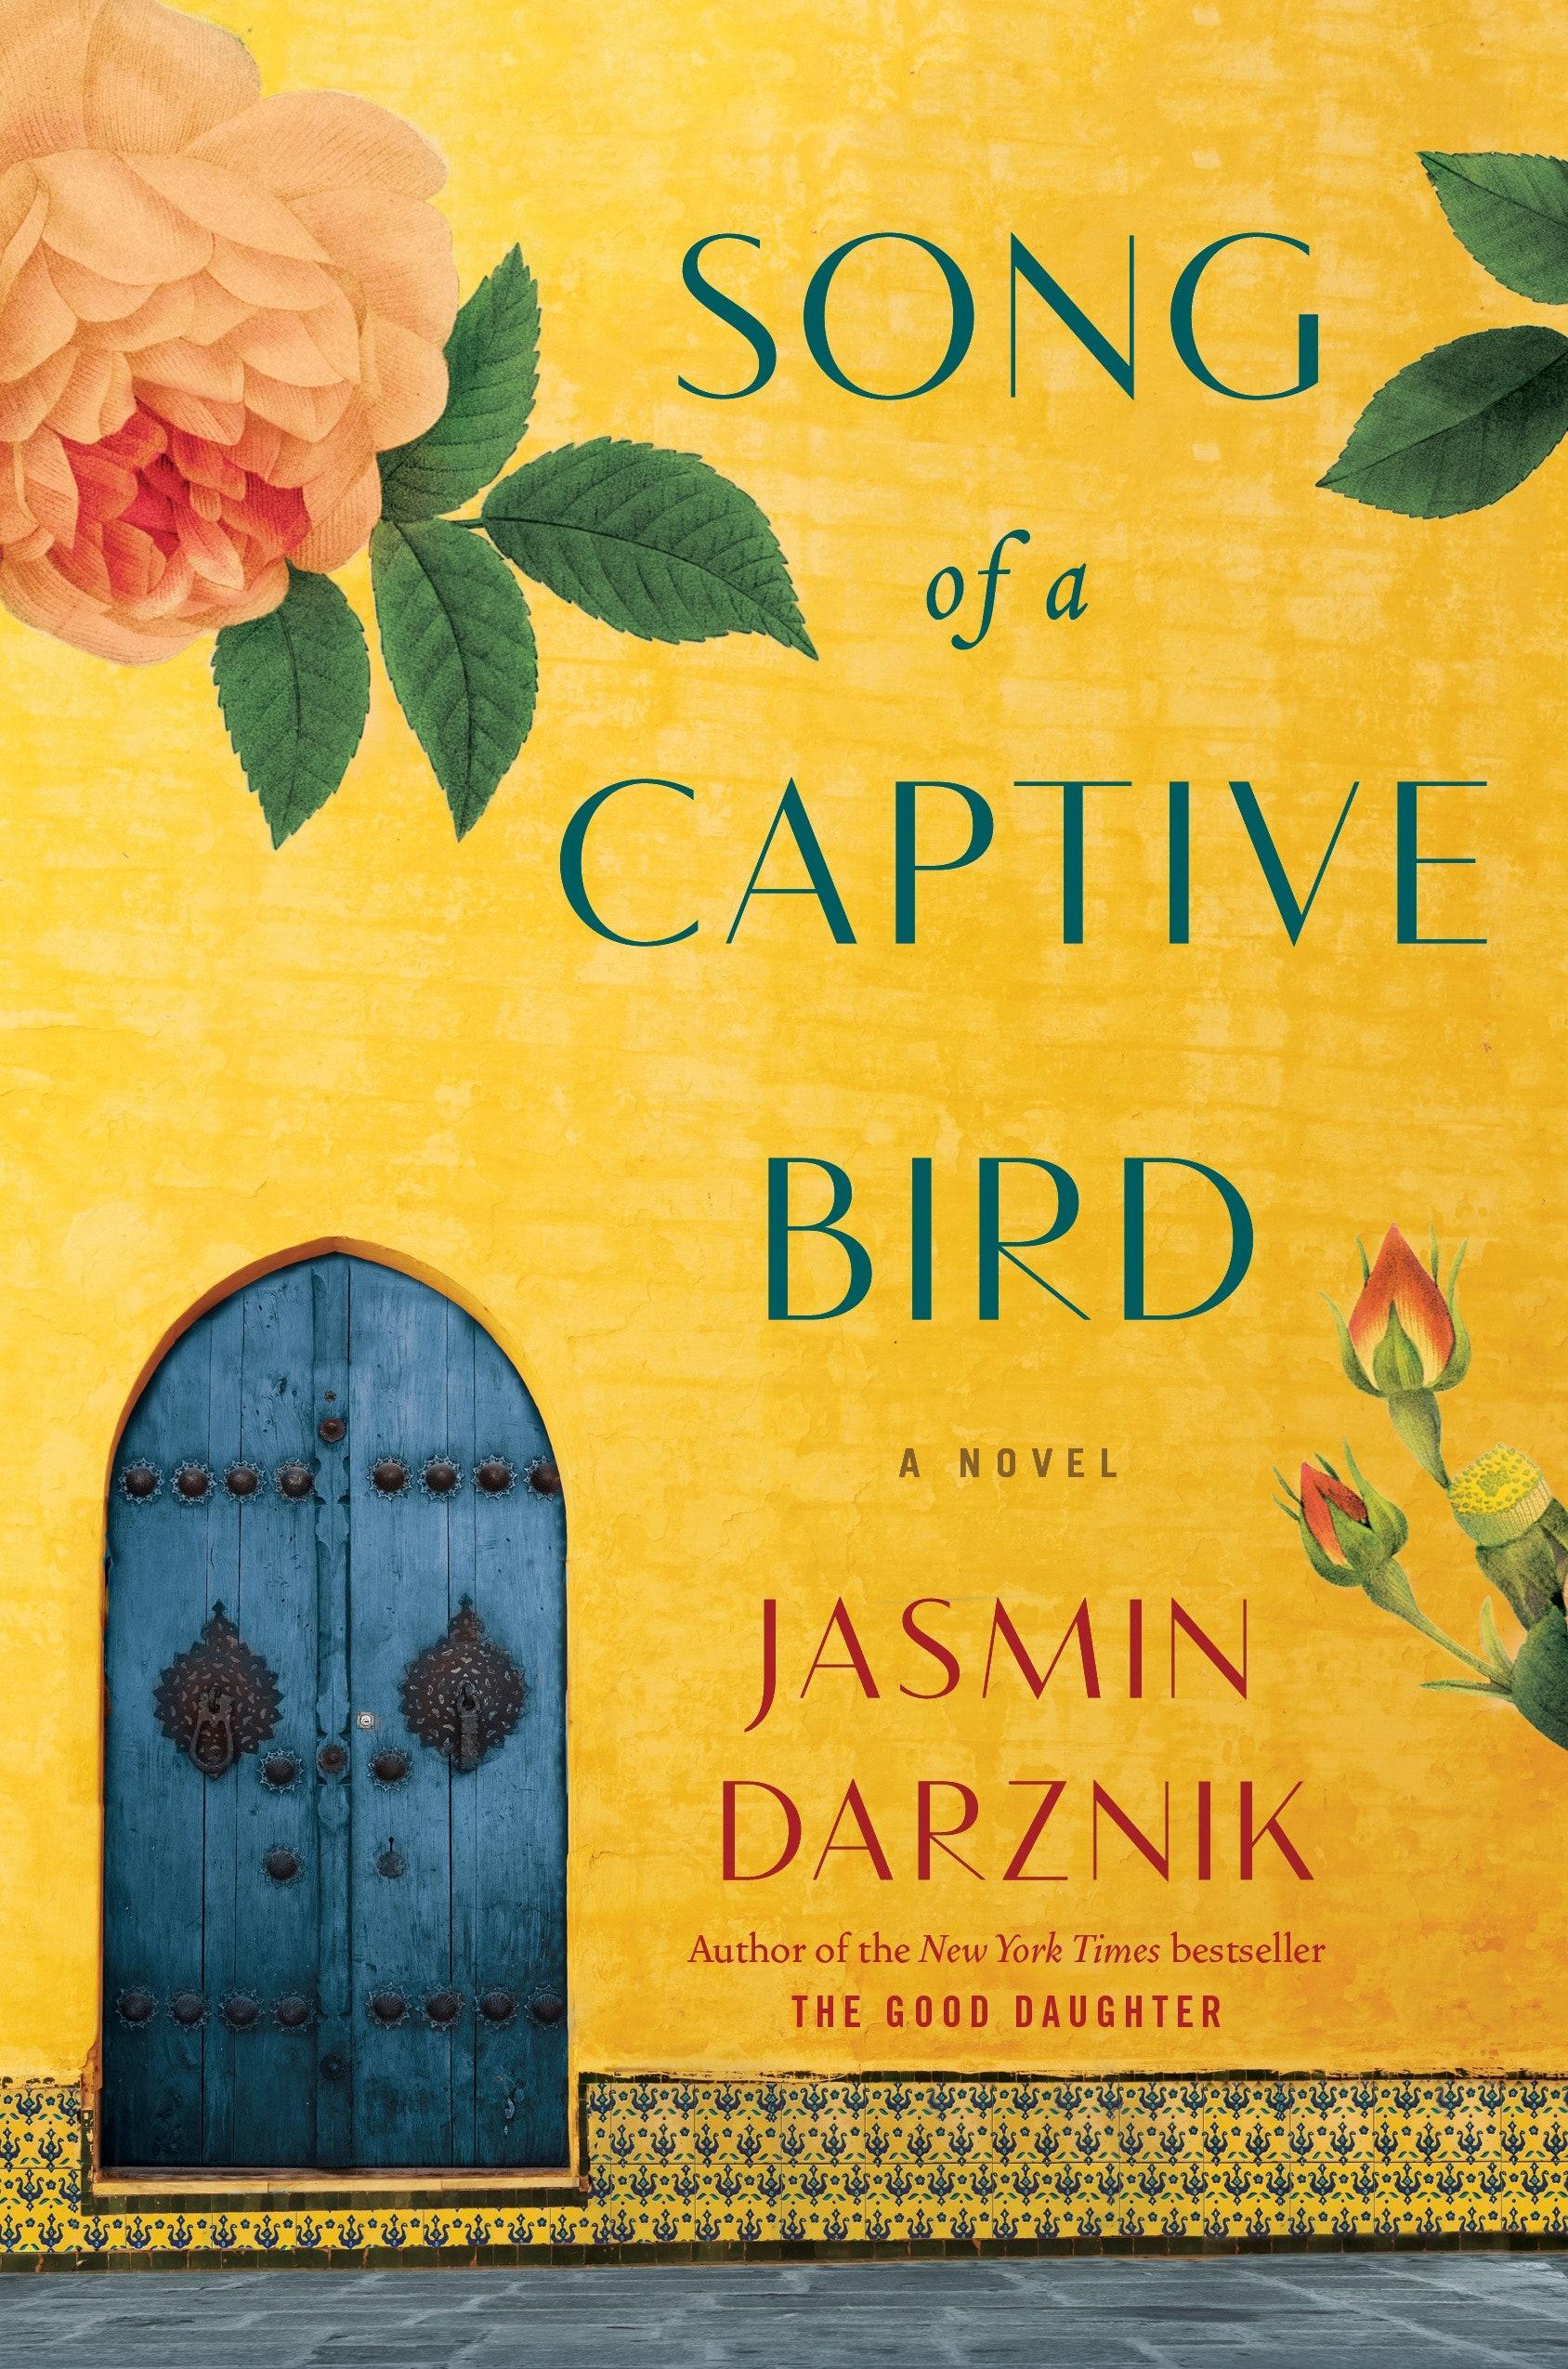 Lit Thursday: *Song of a Captive Bird*